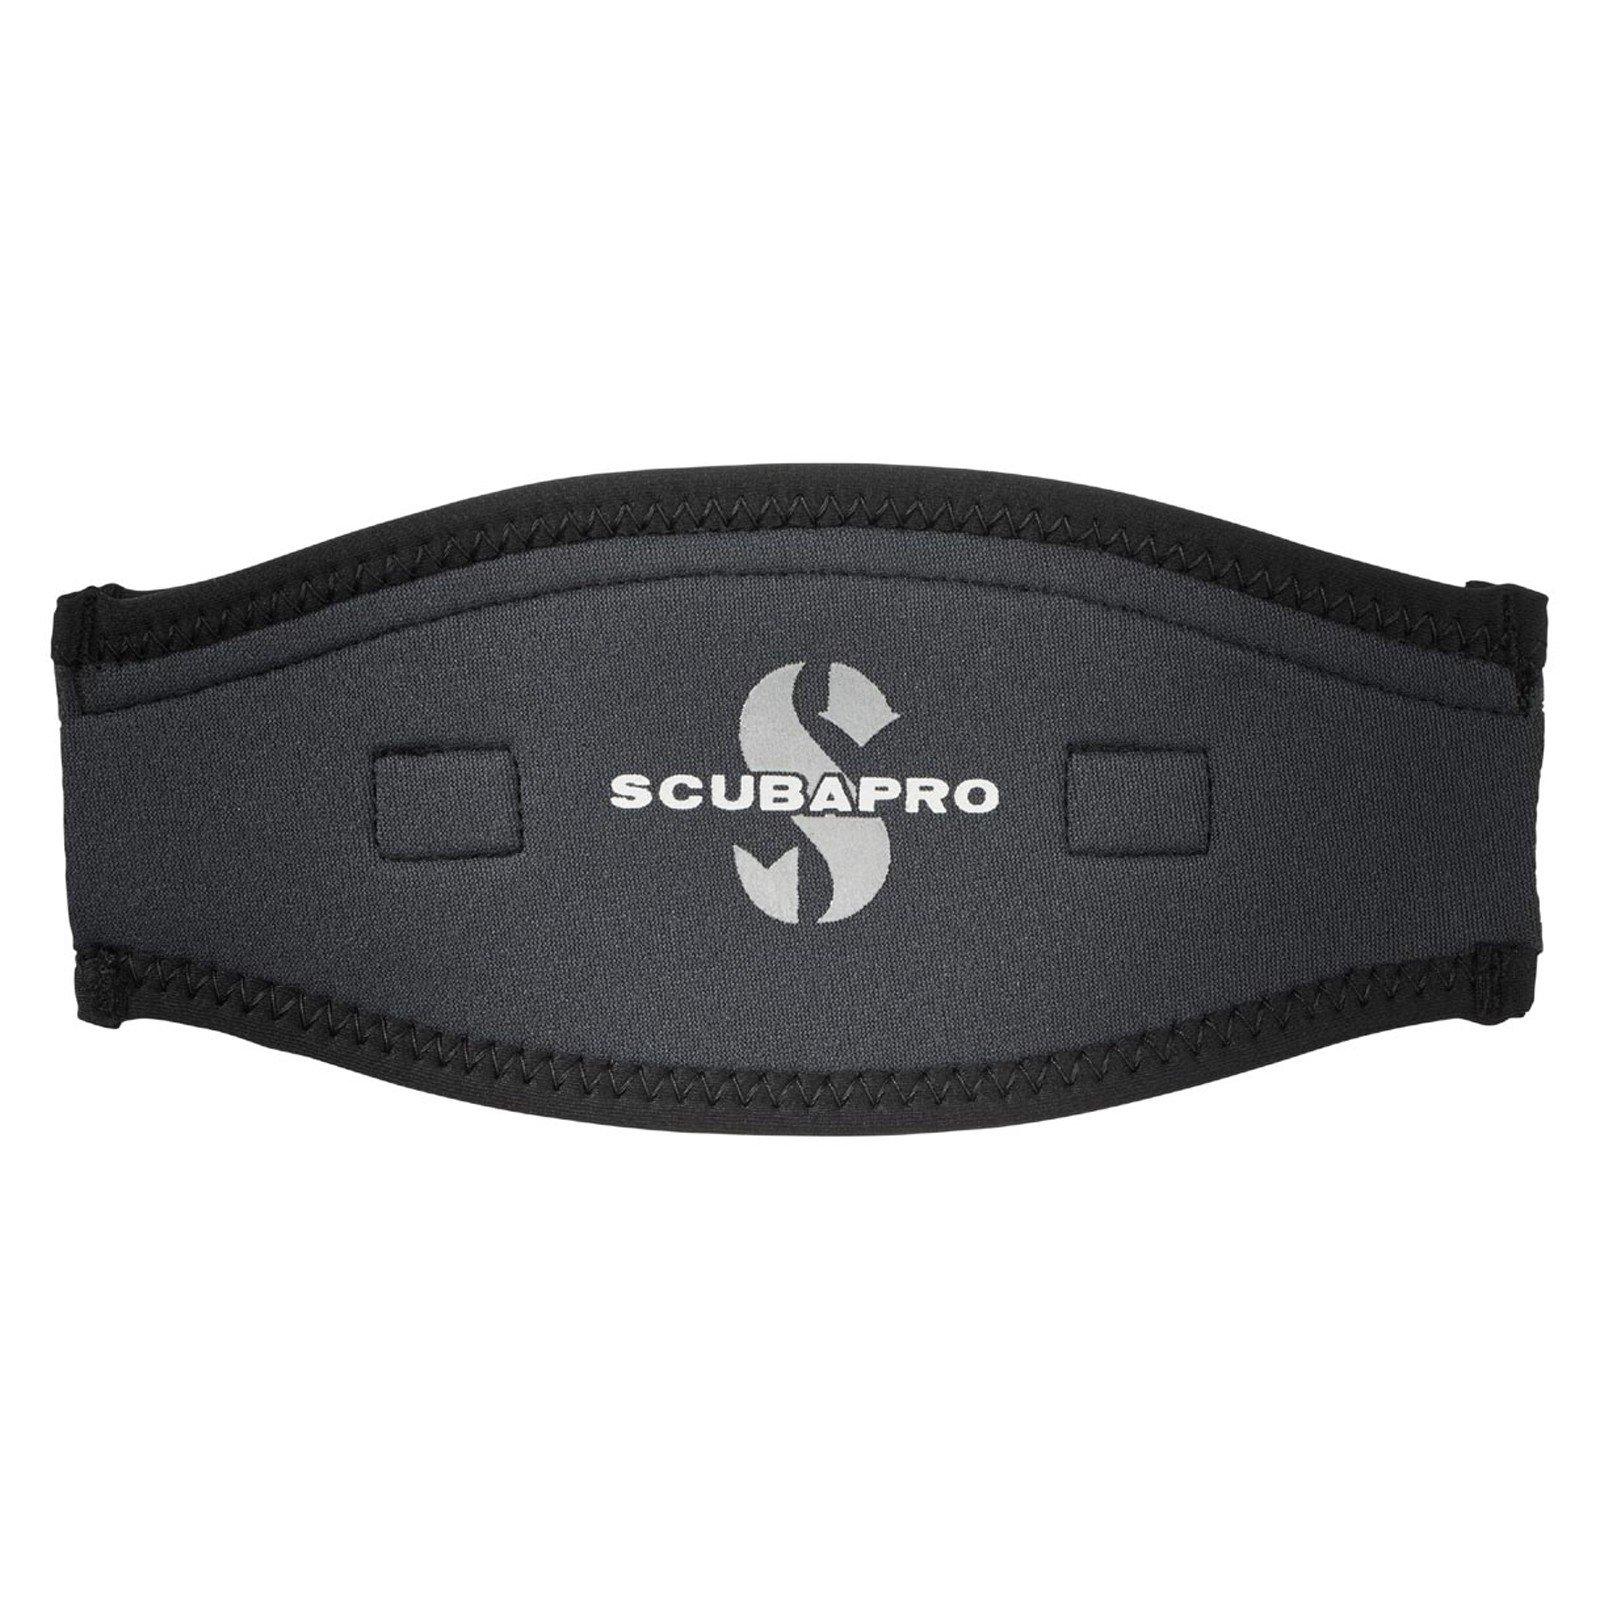 Scubapro Neoprene Mask Strap